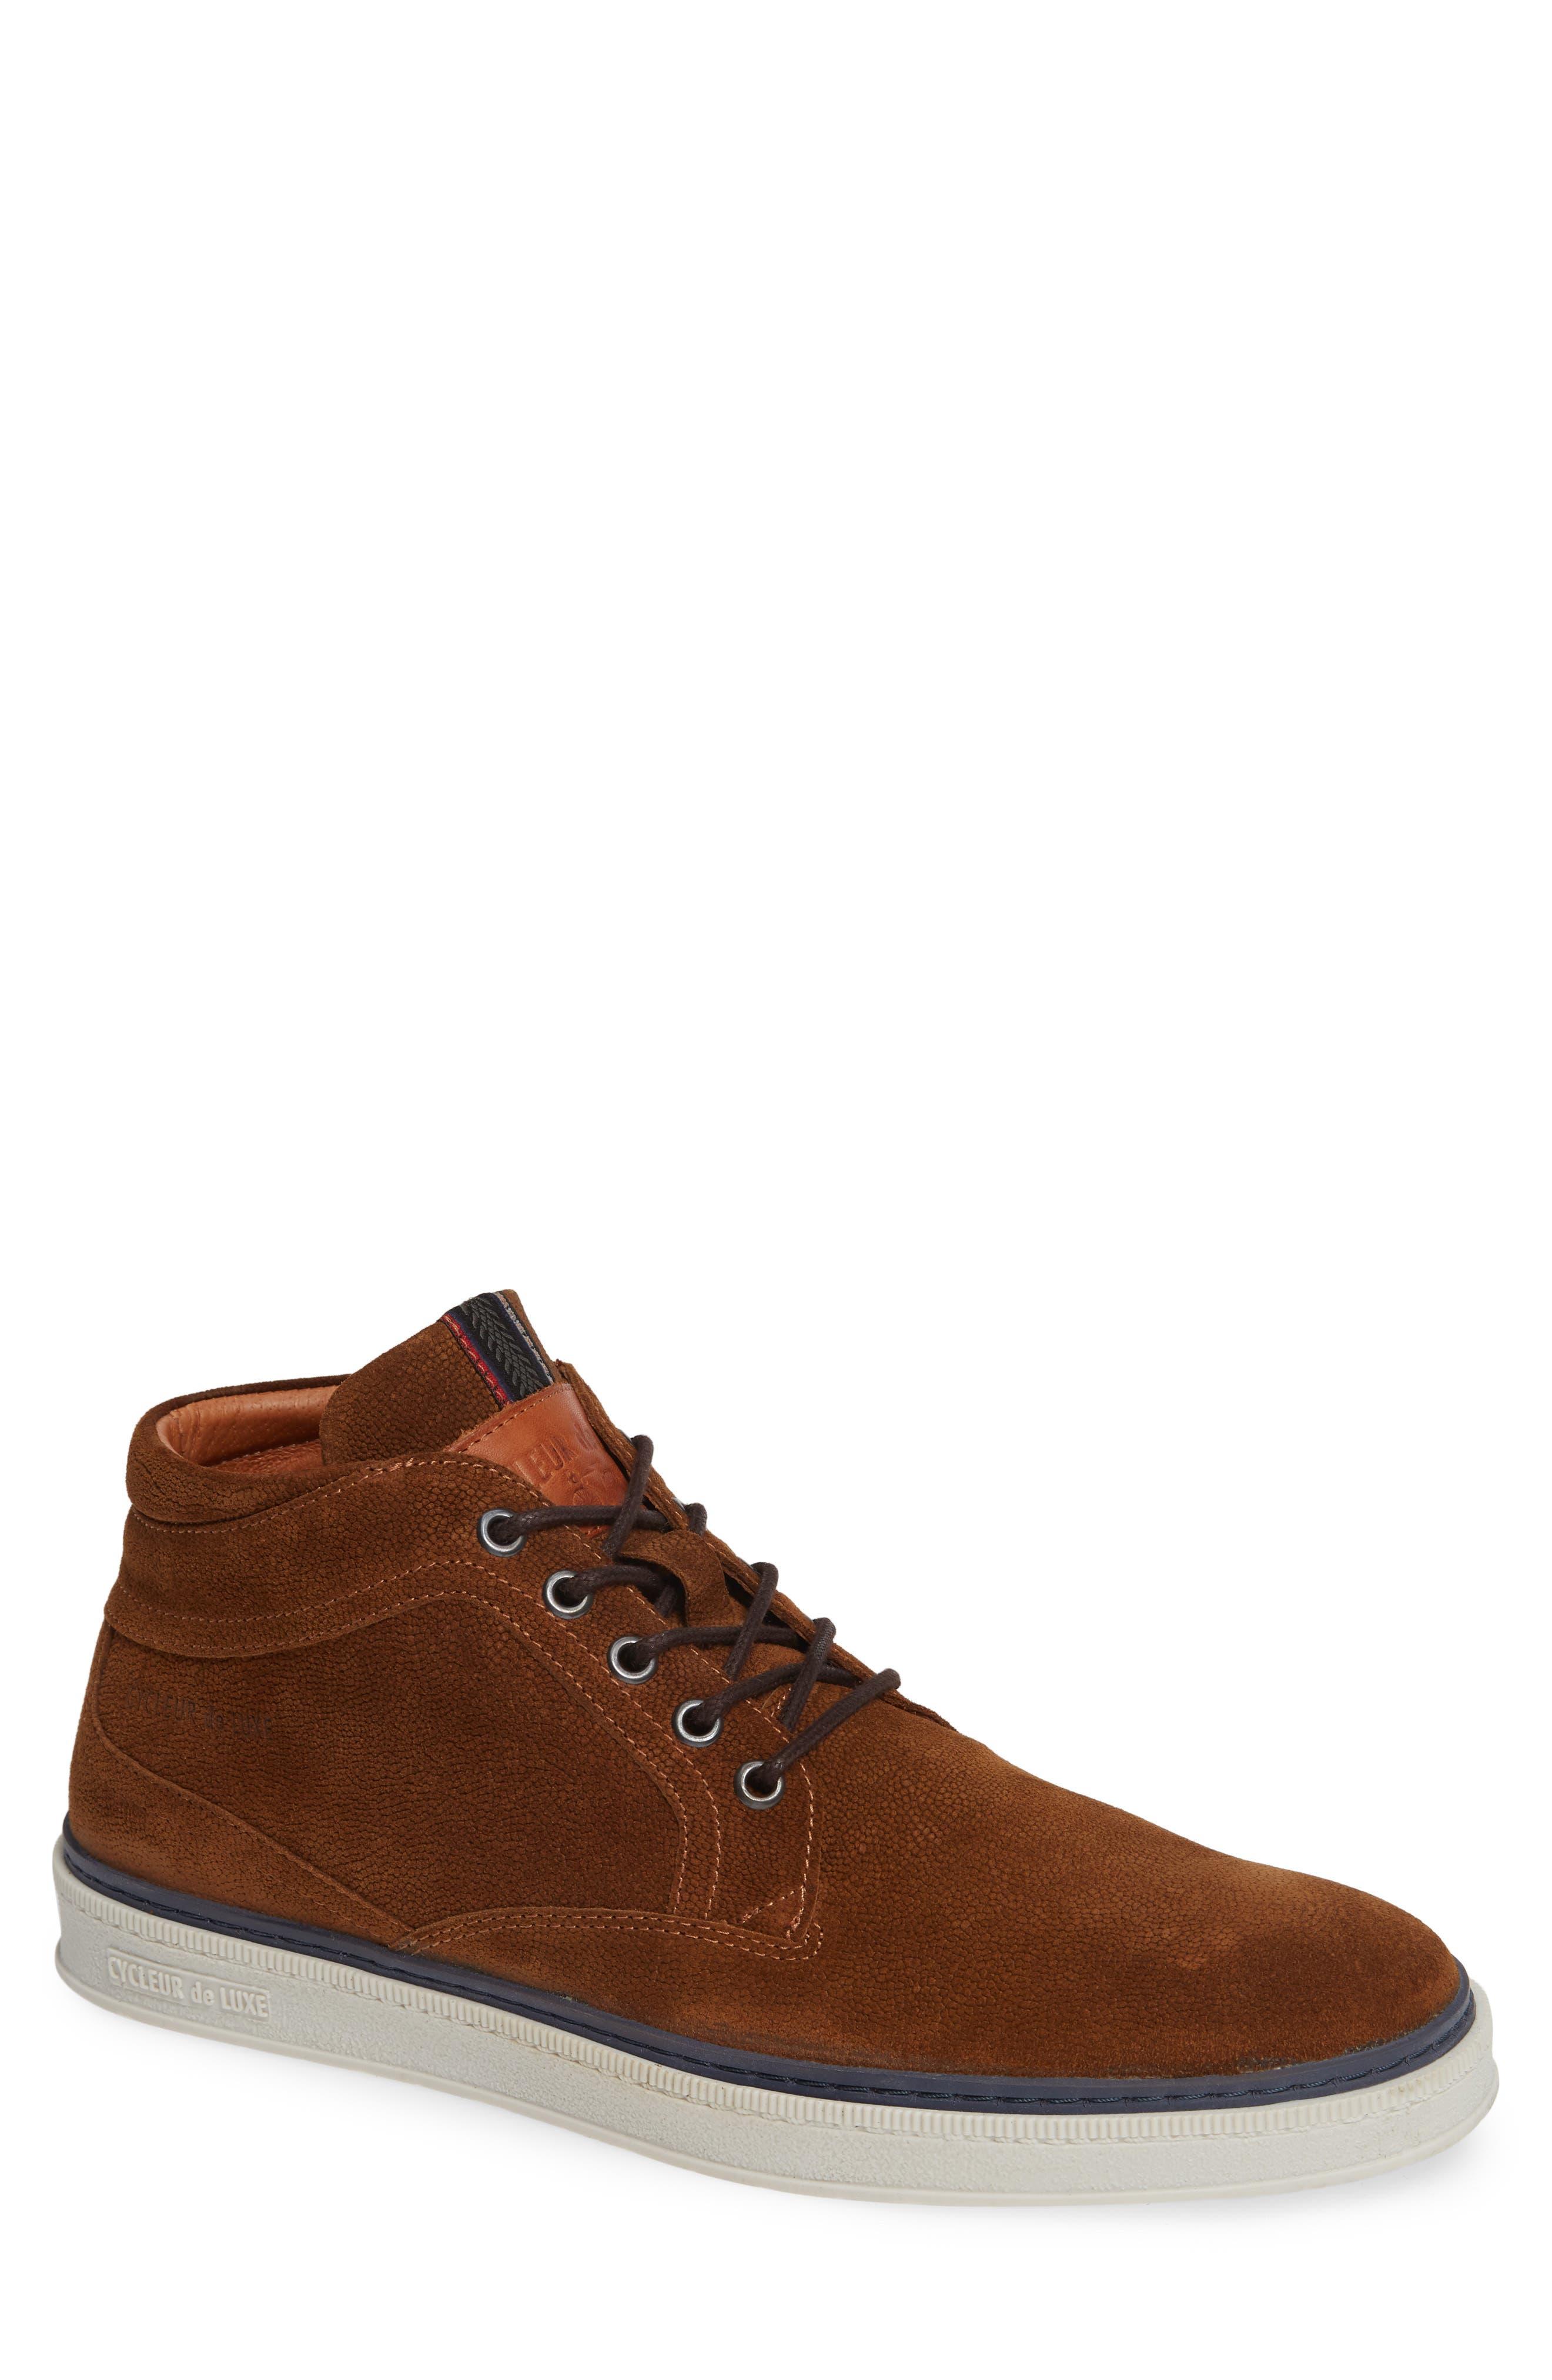 Bilbao Sneaker,                             Main thumbnail 1, color,                             COGNAC